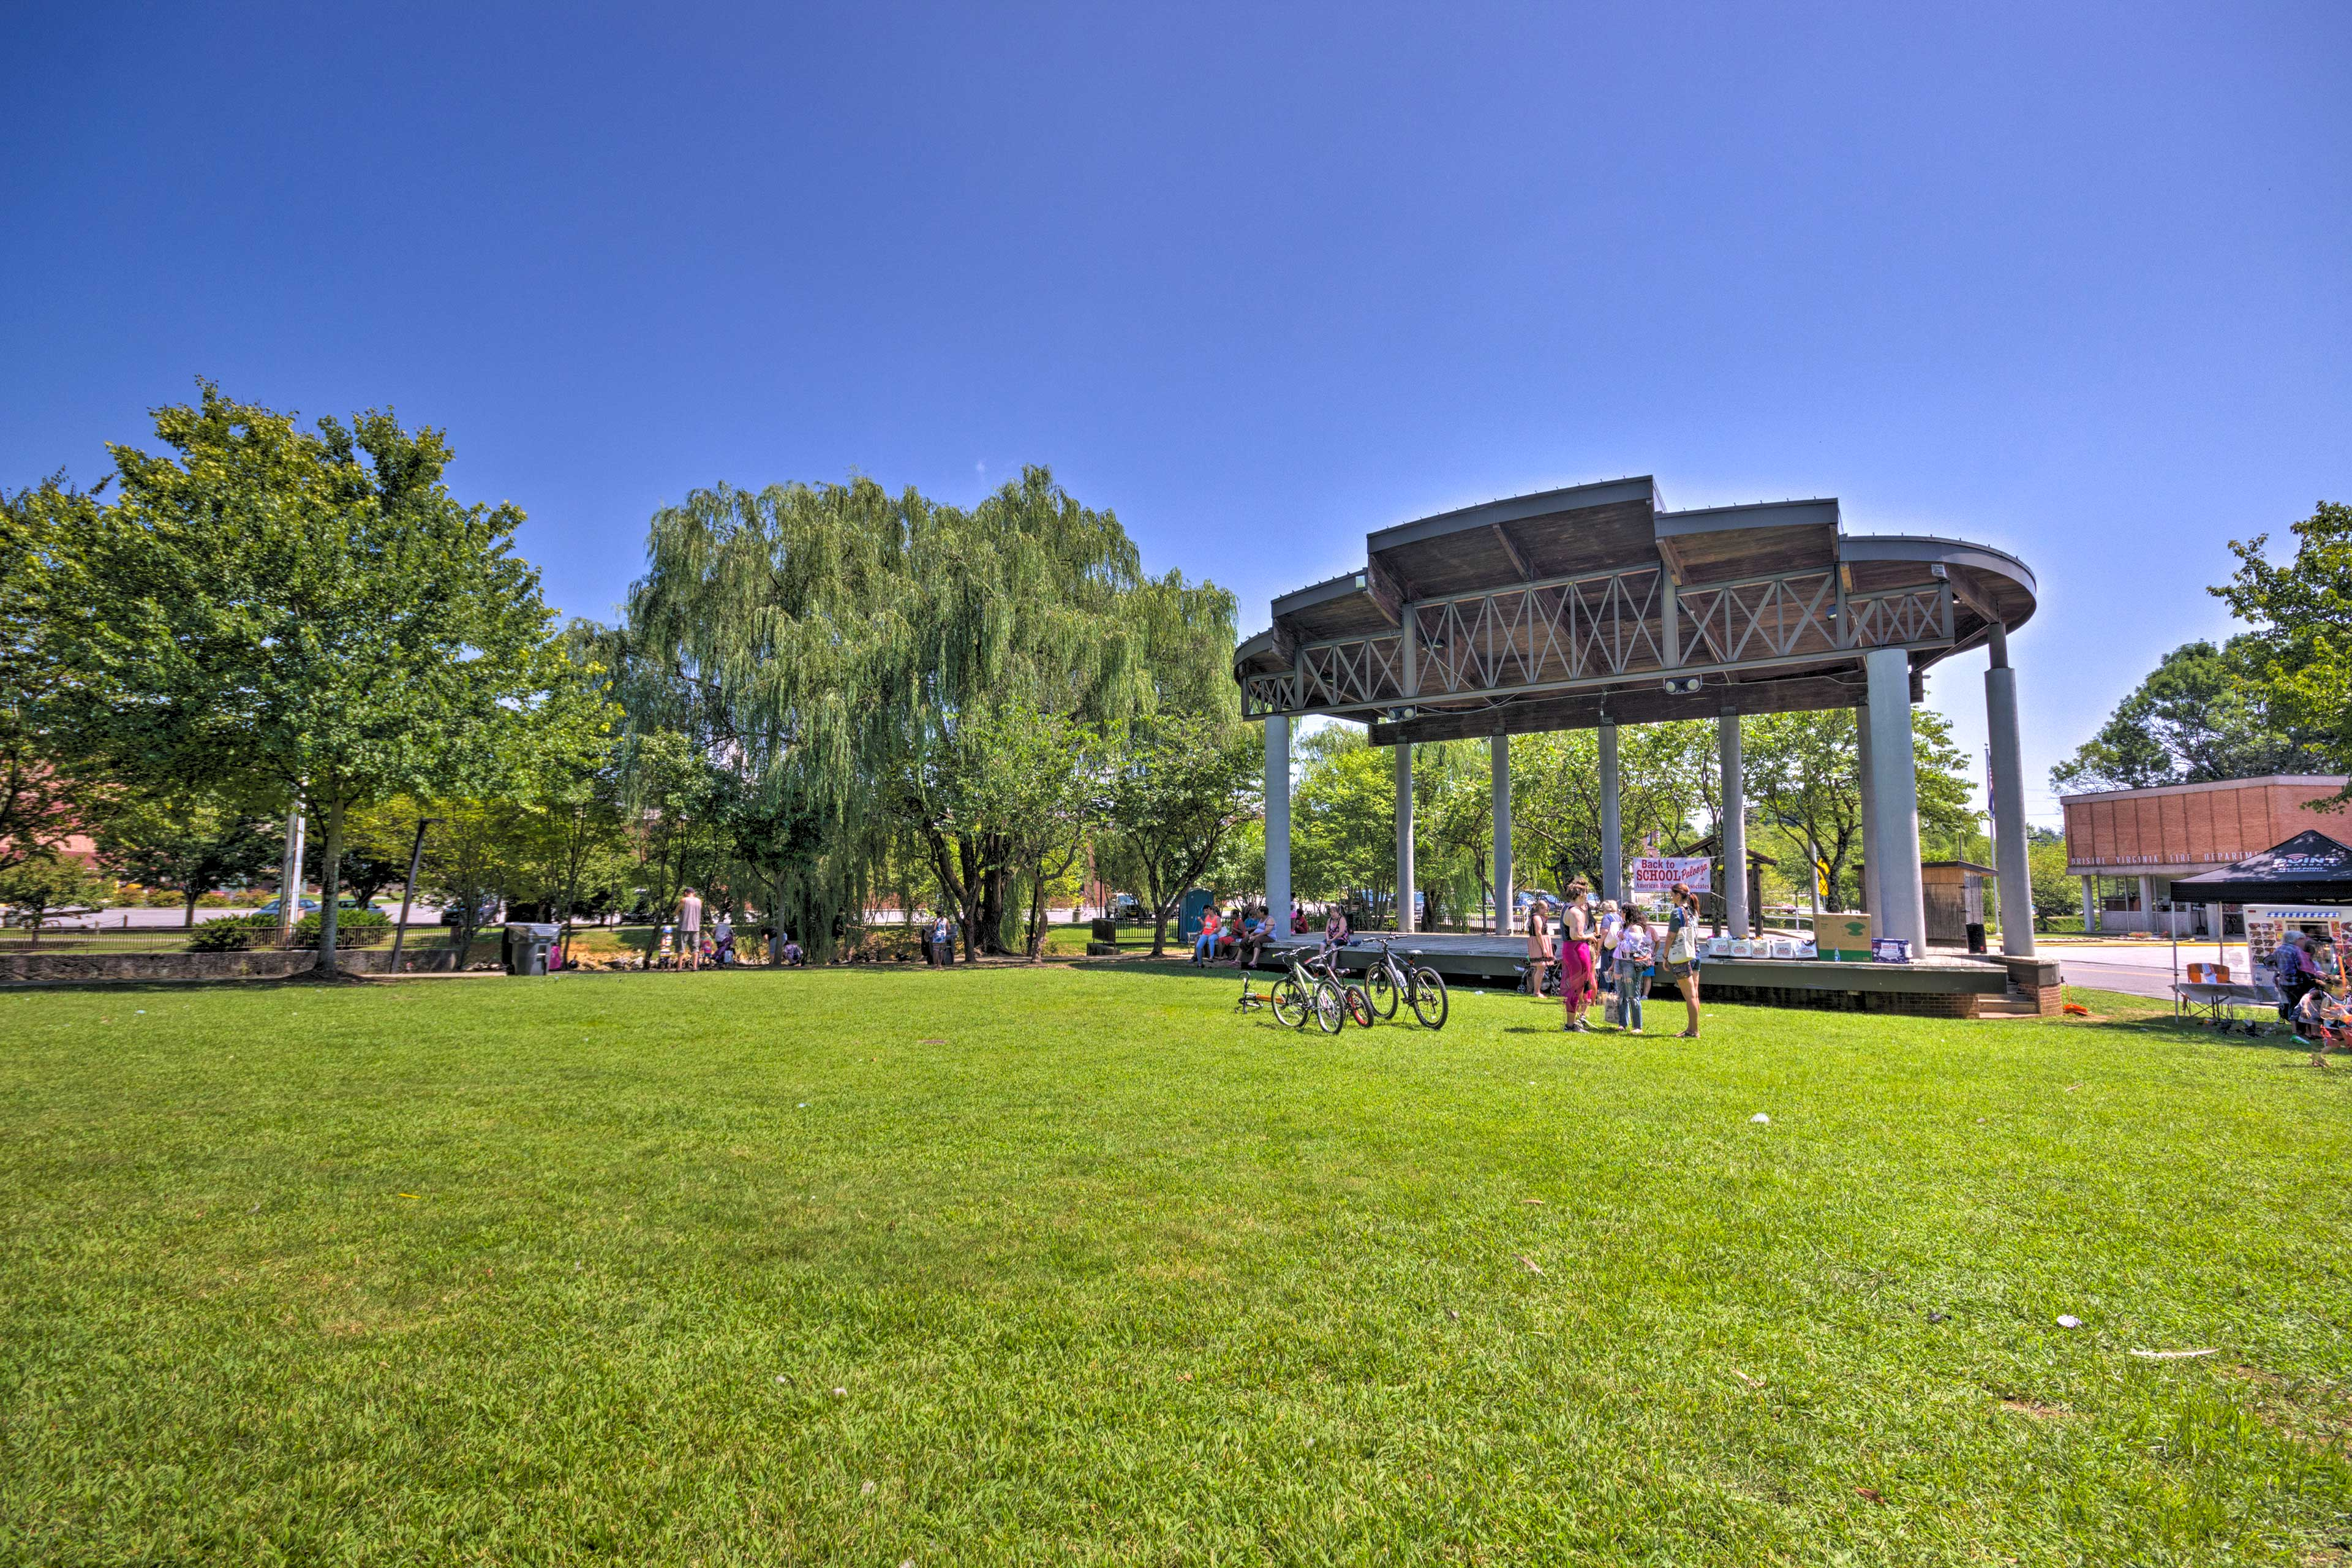 Enjoy leisurely strolls through the park.